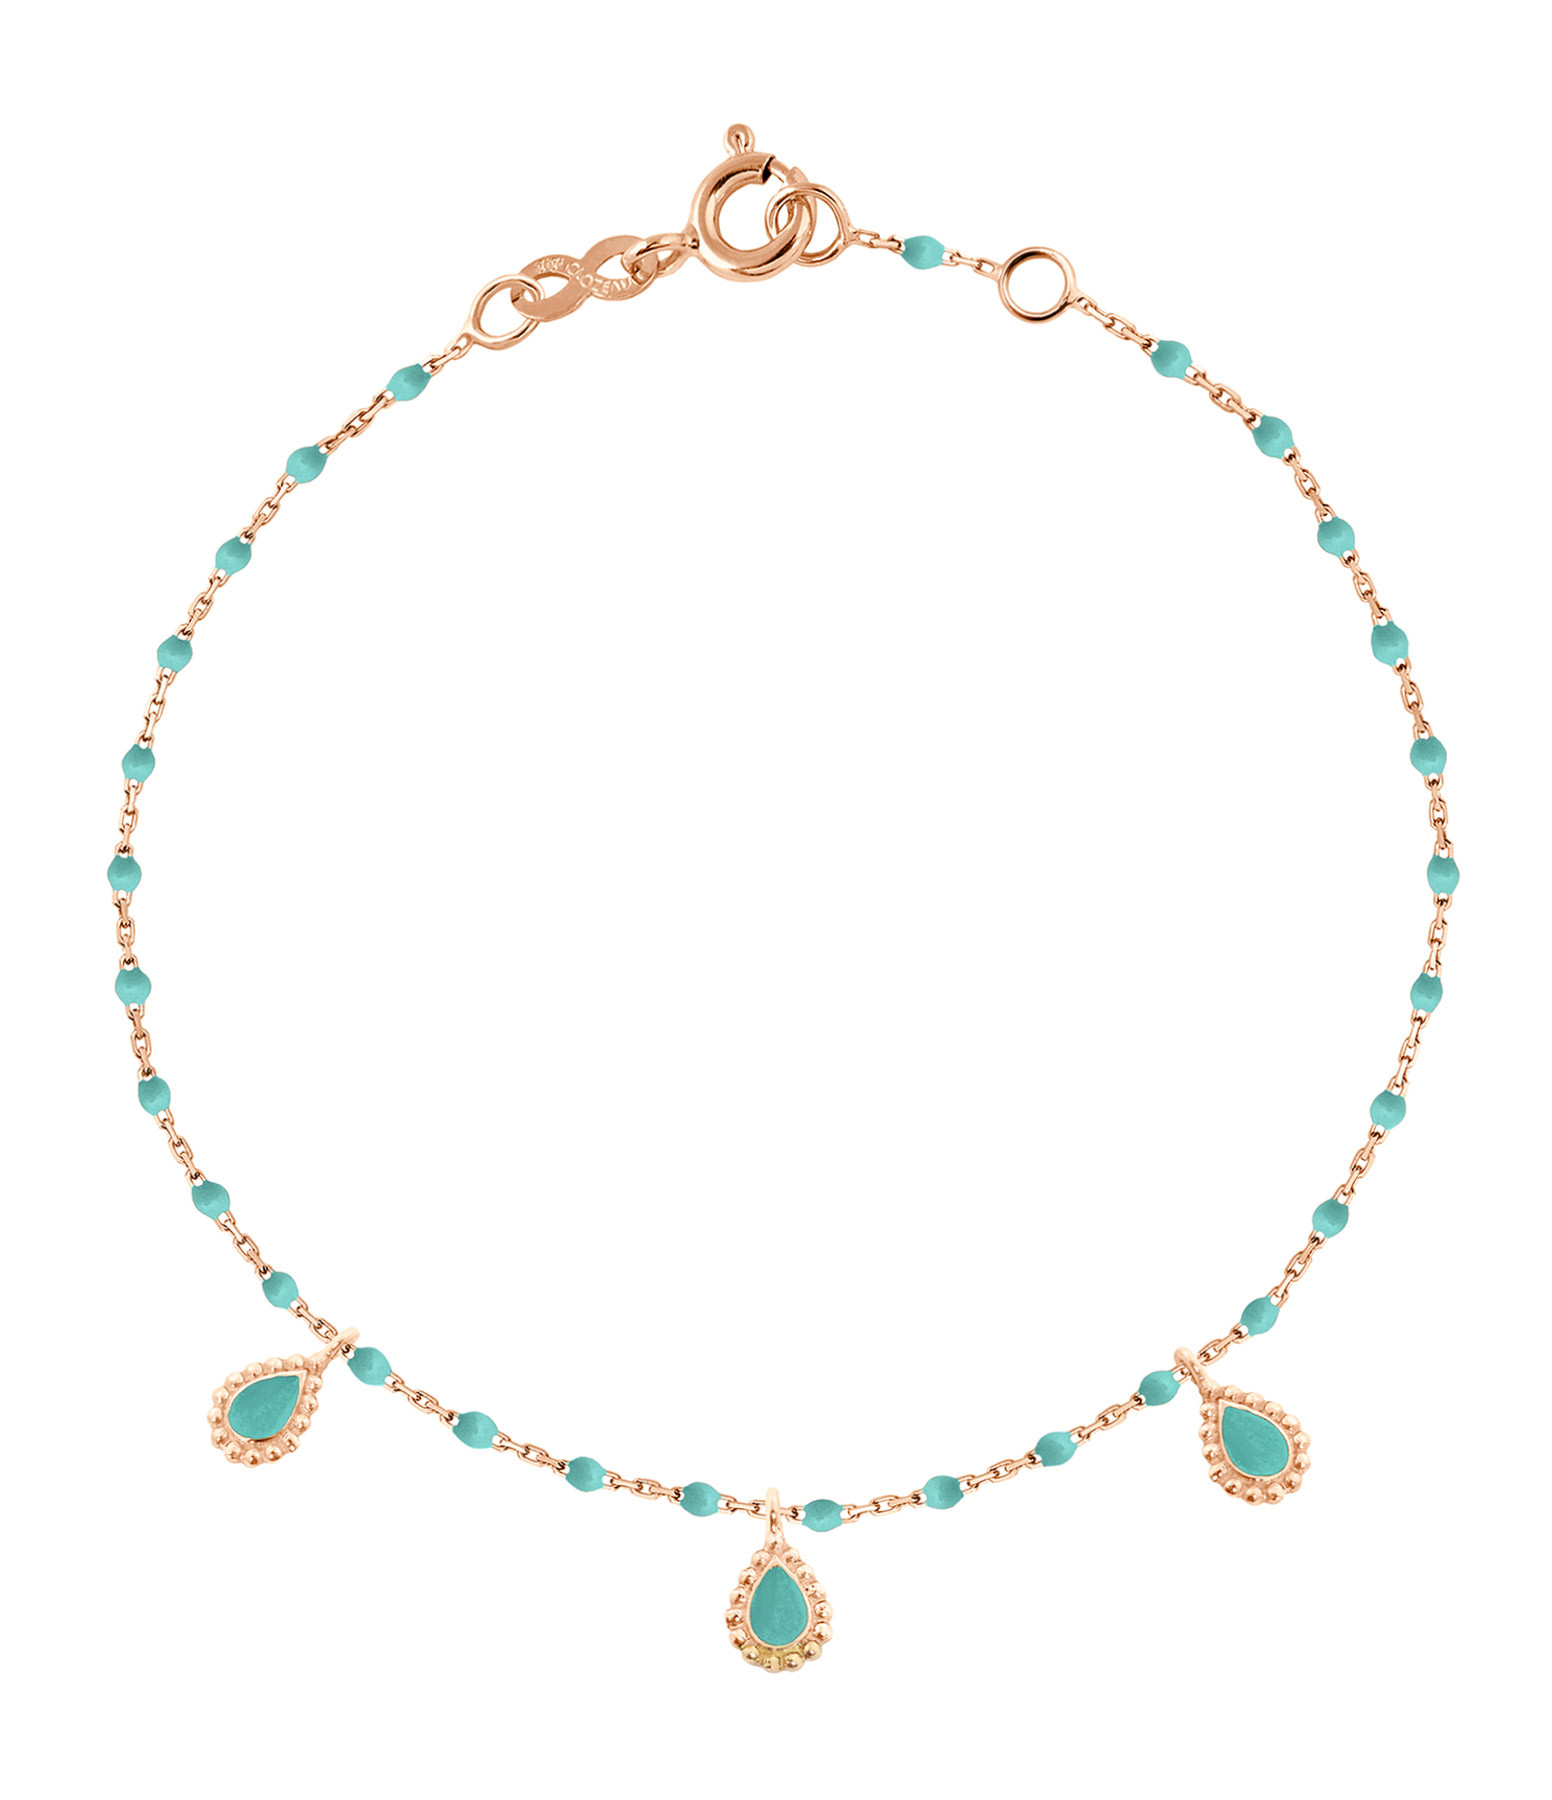 GIGI CLOZEAU - Bracelet Mini Perles Résine 3 Lucky Cachemire OR